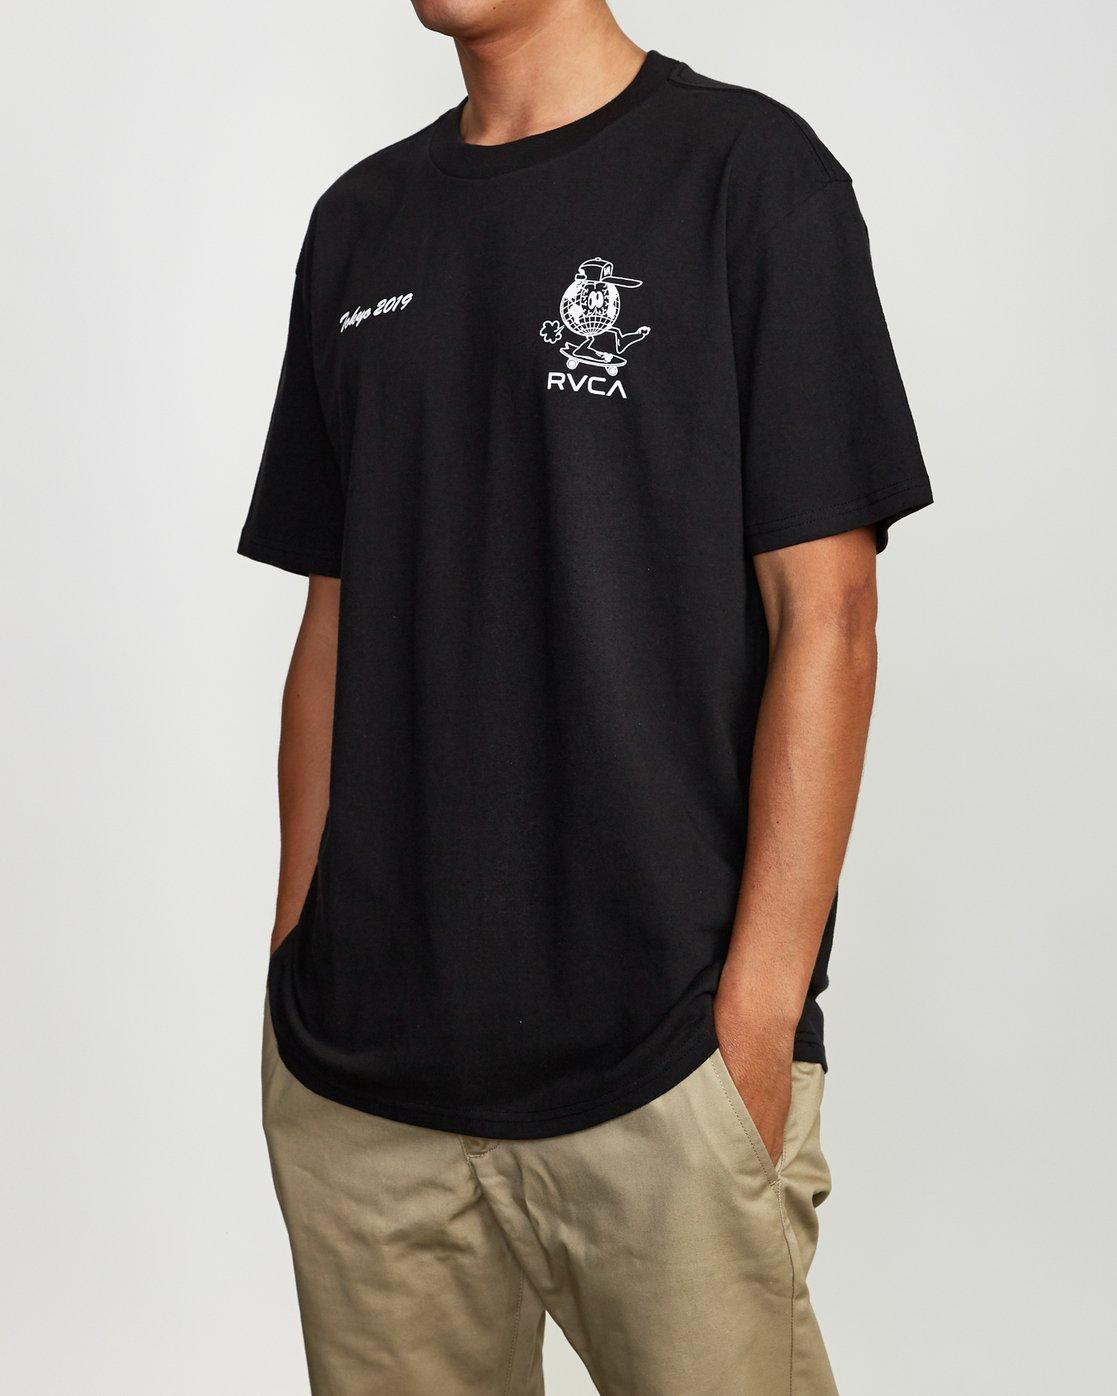 3 RVCA Shibuya T-Shirt Black M410VRRS RVCA